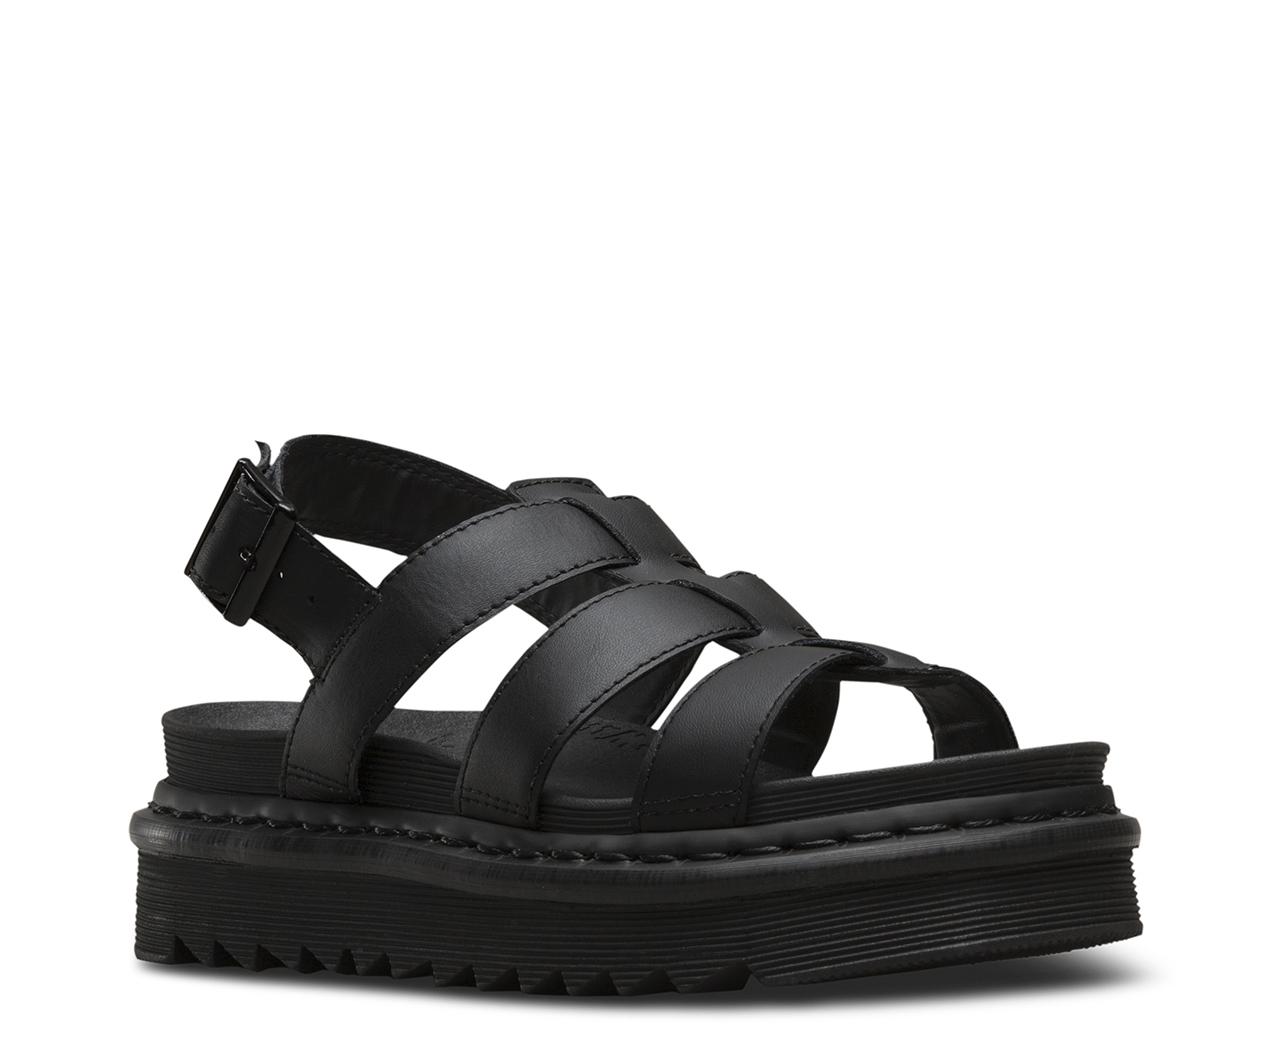 Yelena Summer Shoes Official Eu Dr Martens Store